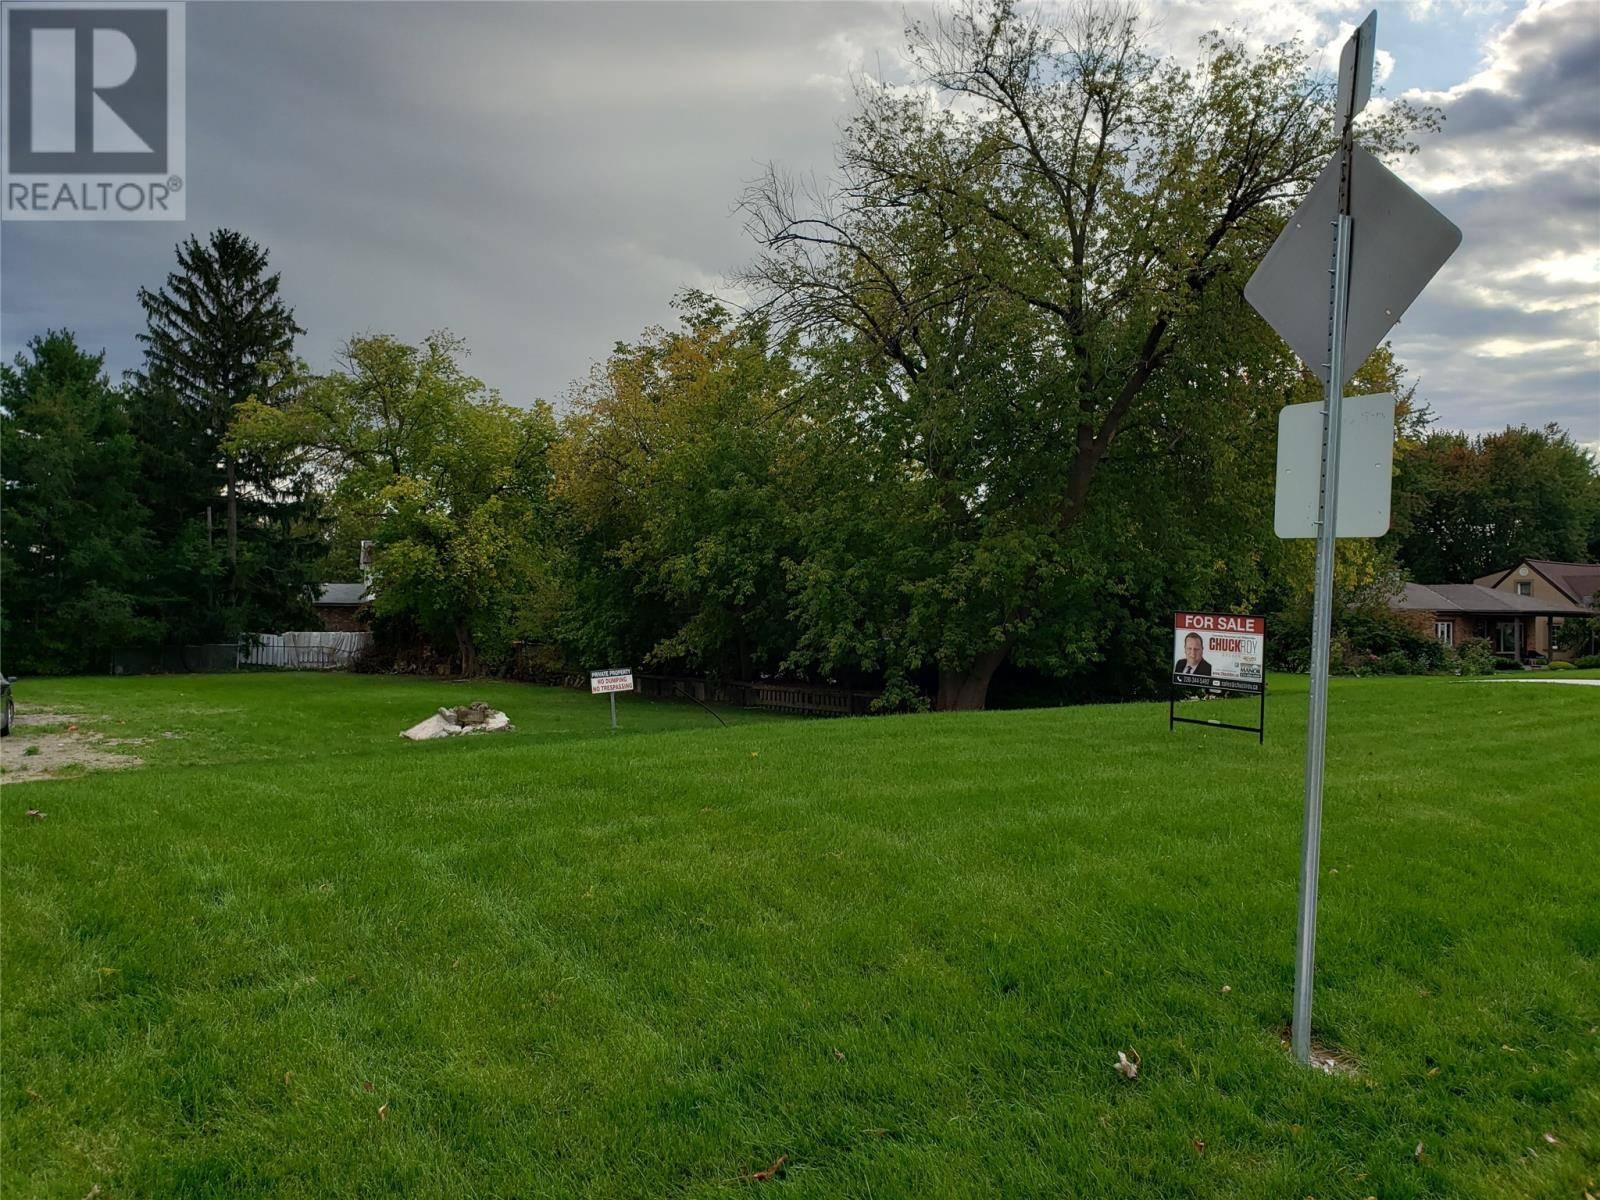 Home for sale at 8535 Riverside Dr East Windsor Ontario - MLS: 19026906